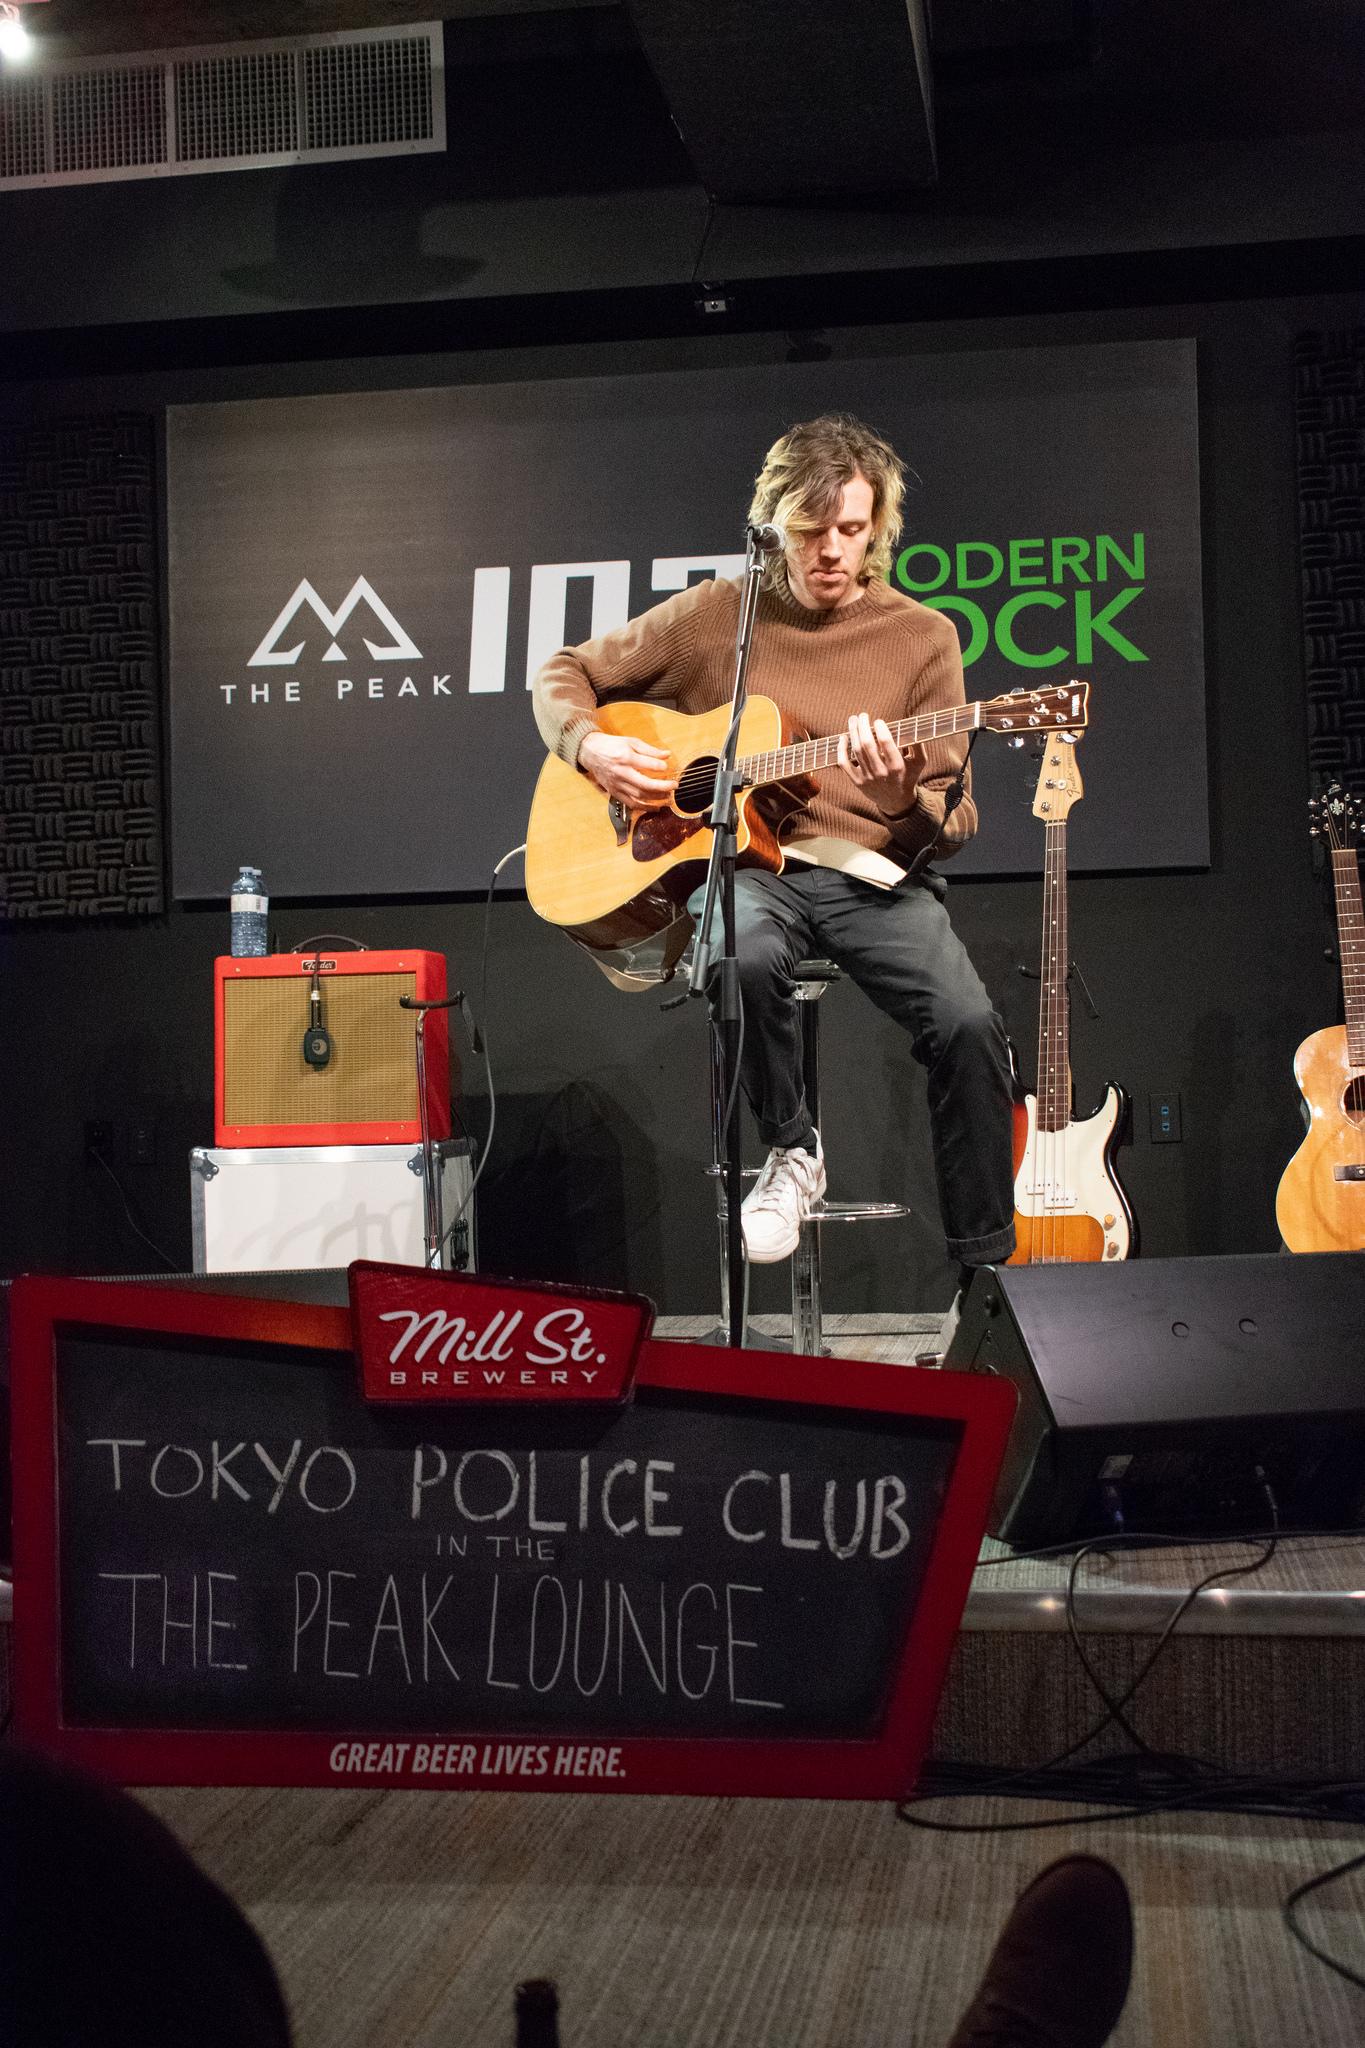 Tokyo Police Club in THE PEAK Lounge